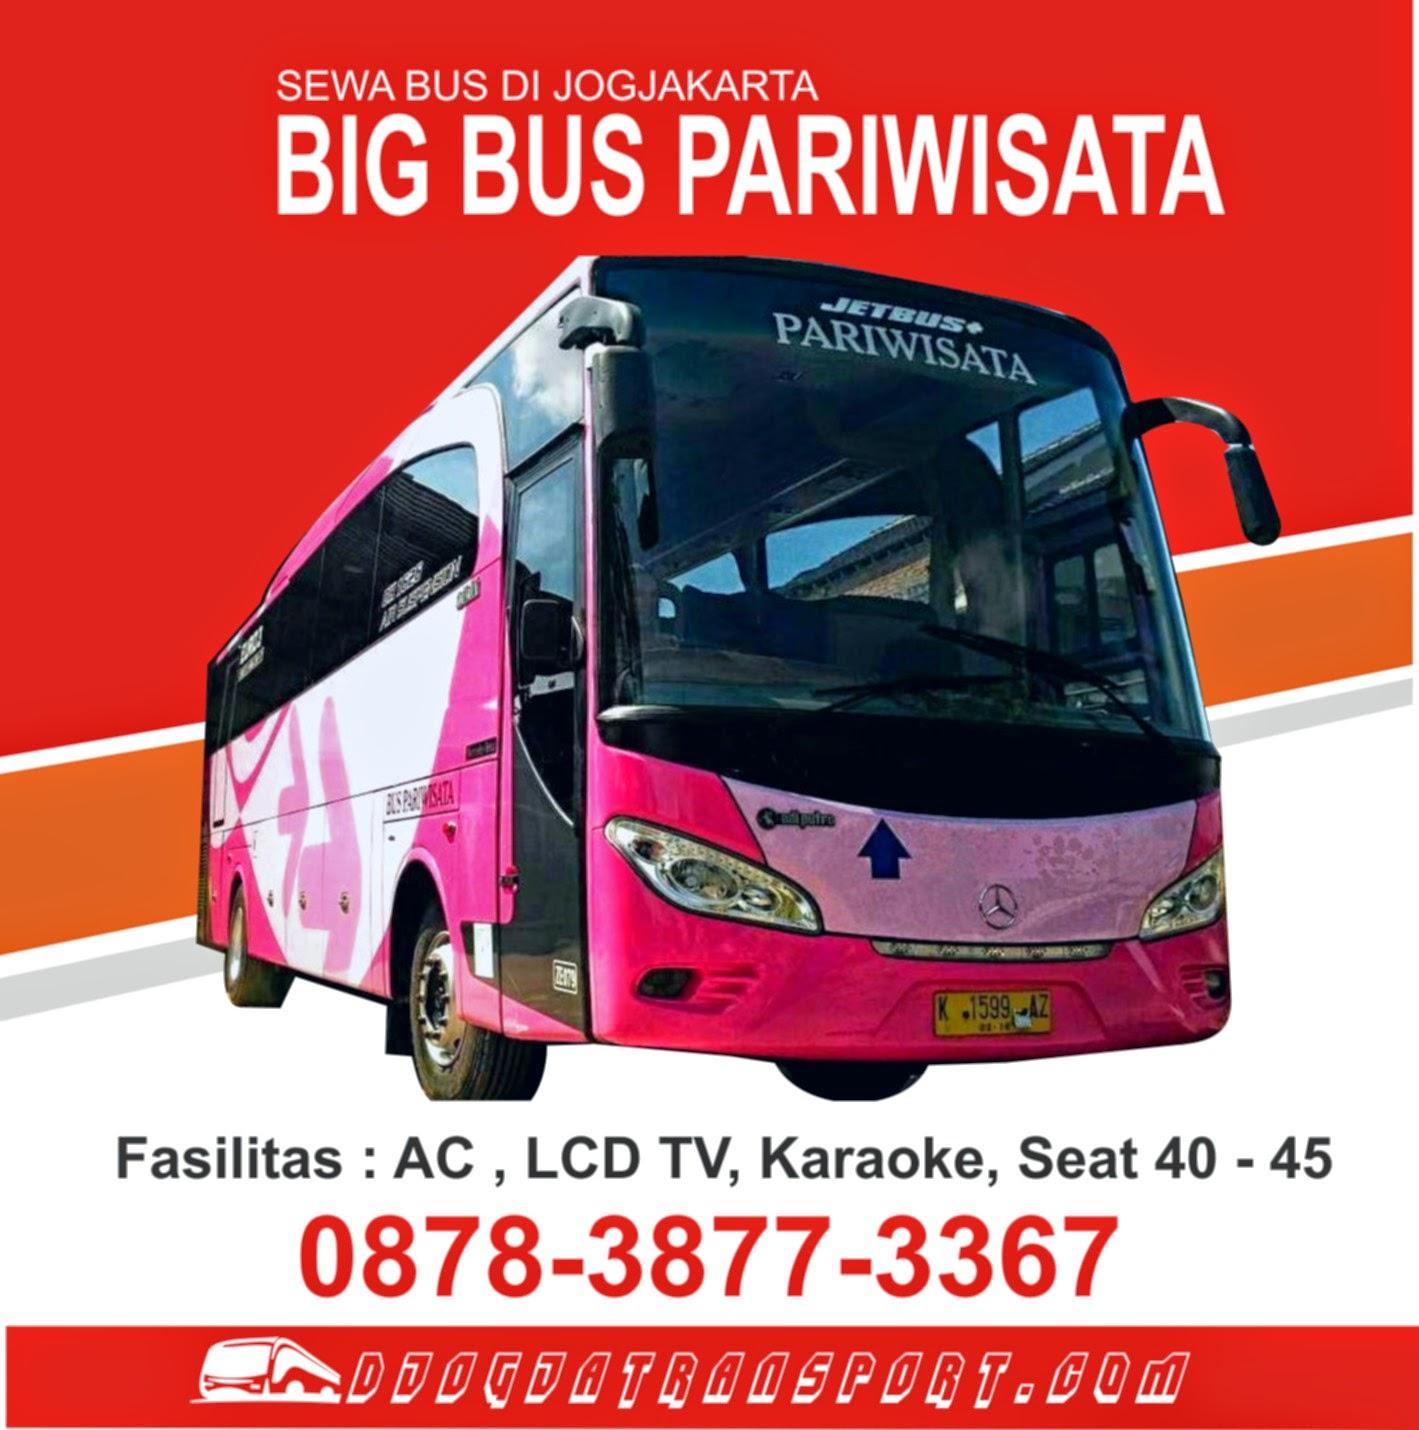 sewa-big-bus-Jogjakarta-untuk-wisata